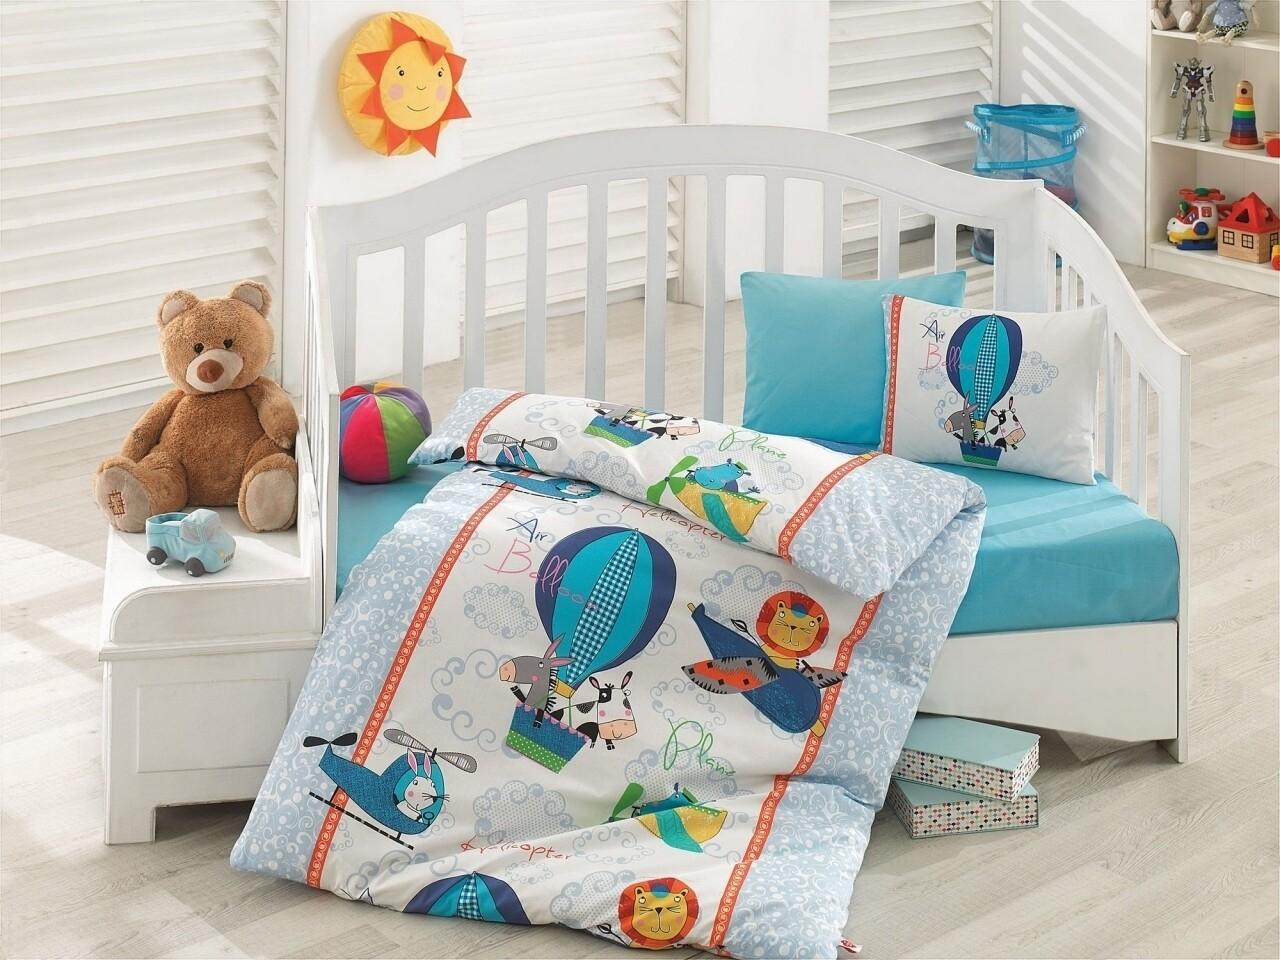 Lenjerie de pat pentru copii, 4 piese, 100% bumbac ranforce, Cotton Box, Air